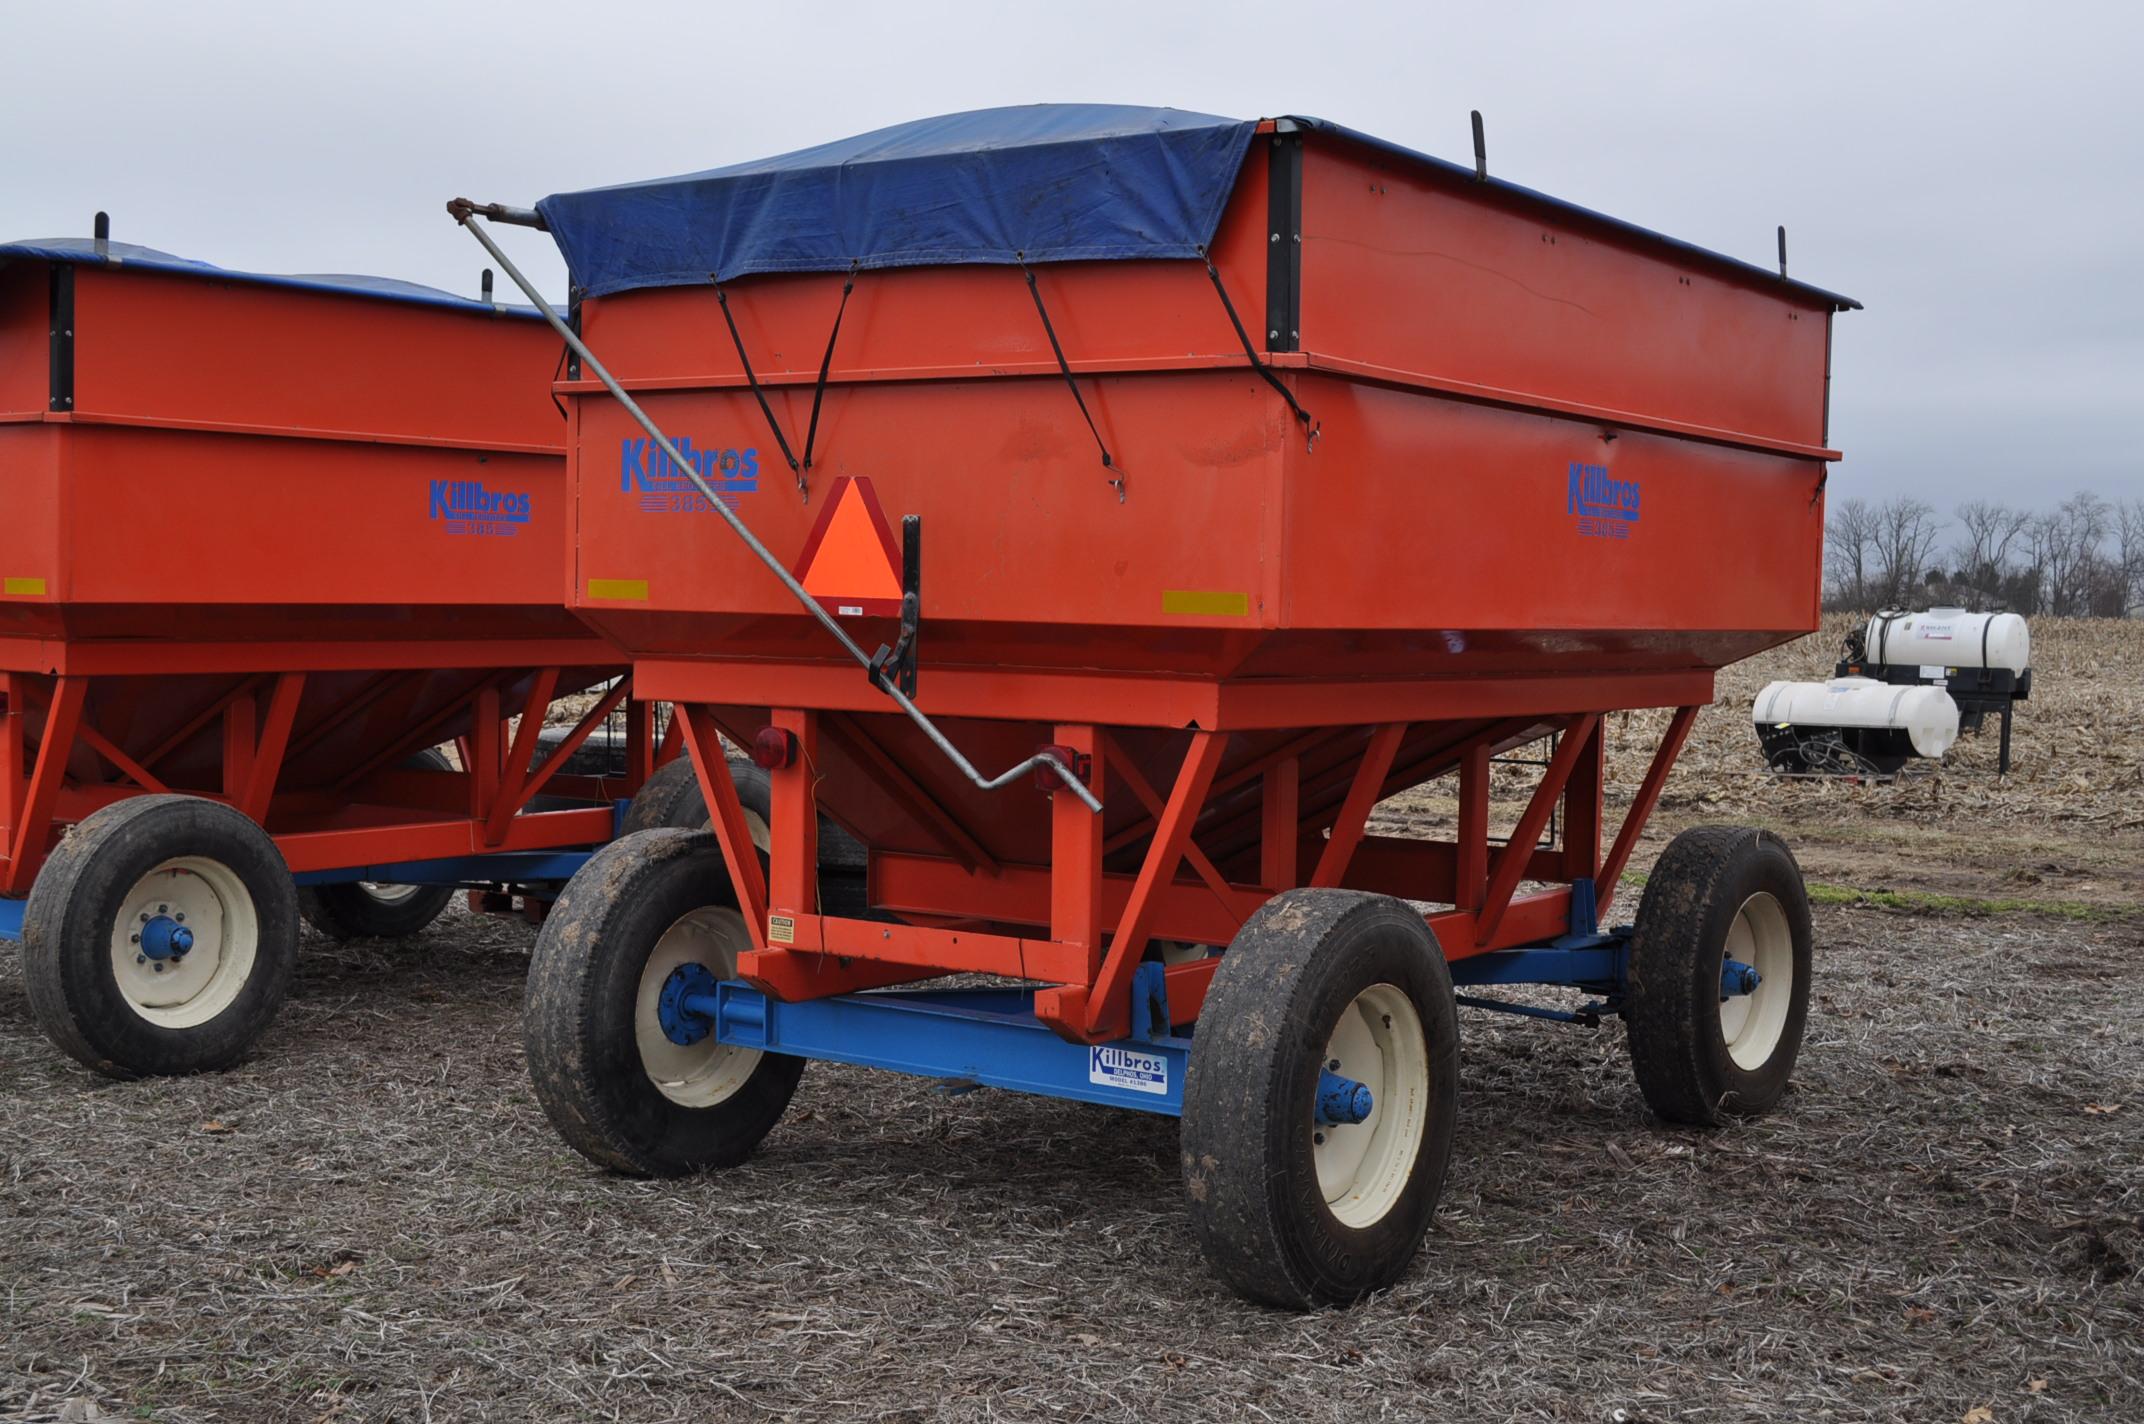 Killbros 385 gravity bed wagon, tarp, steel rails, Killbros 1386 gear, 11 R 22.5 tires - Image 3 of 7